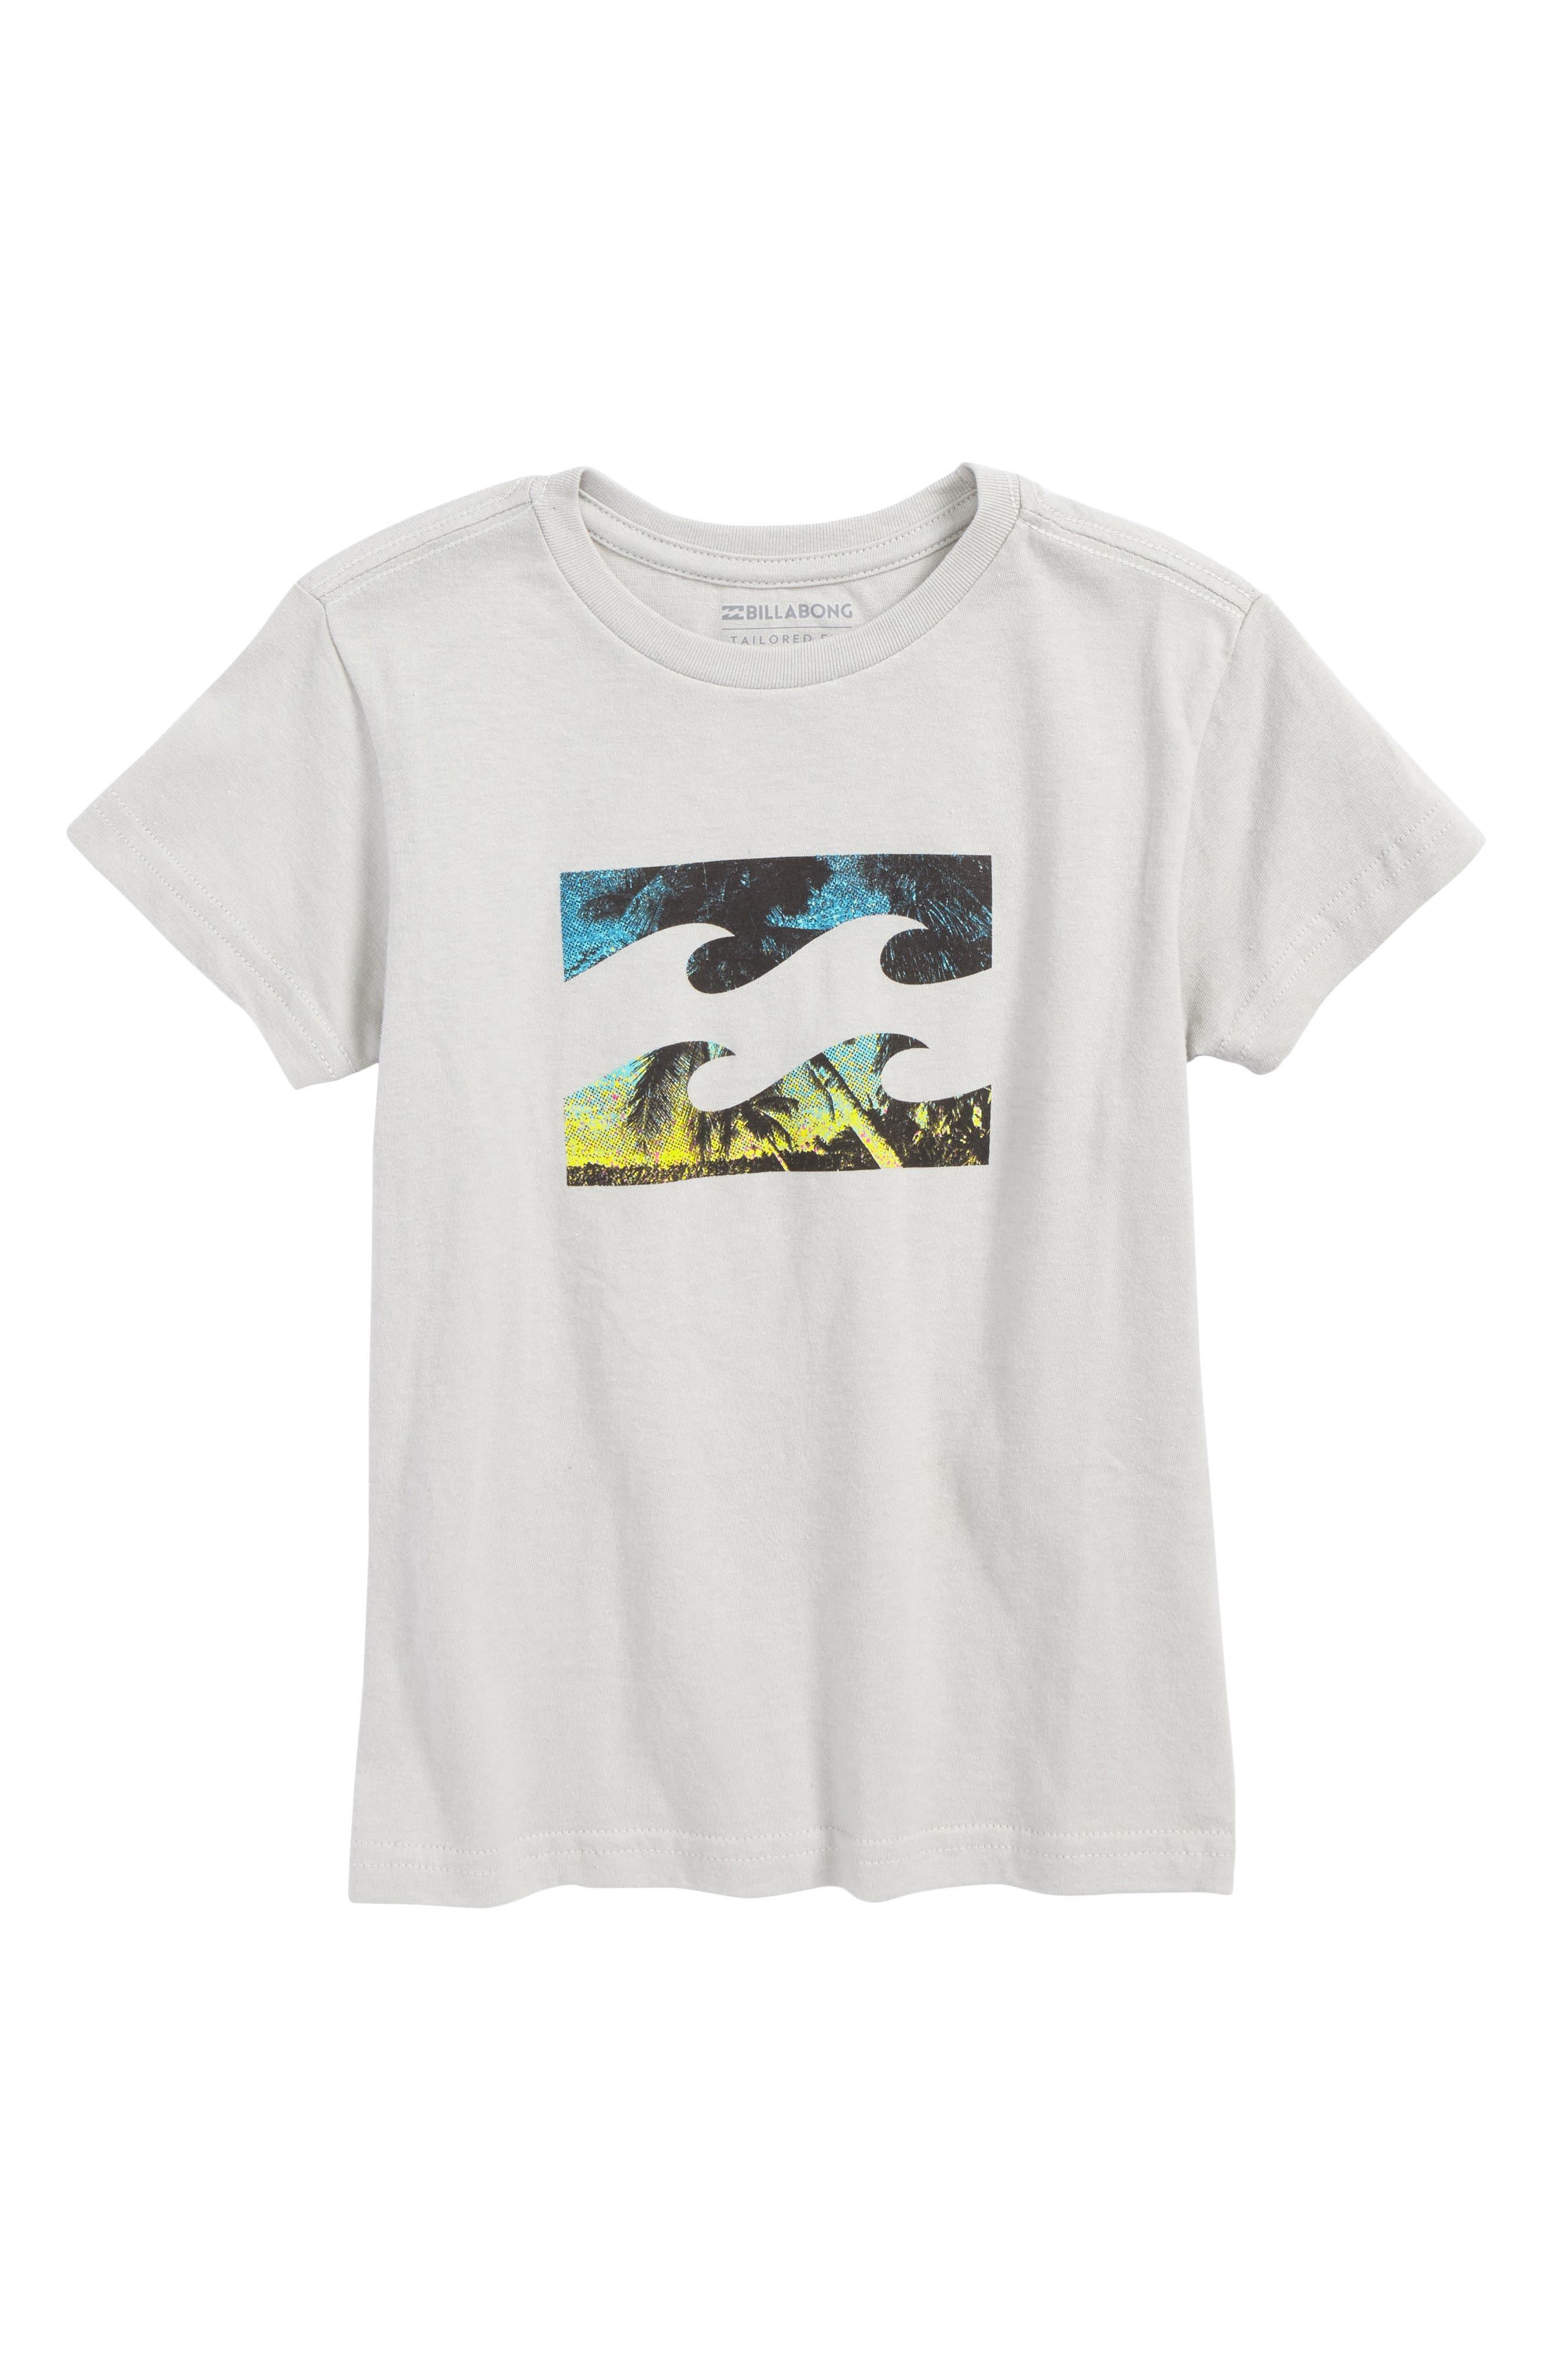 Team Wave Graphic T-Shirt,                             Main thumbnail 1, color,                             Silver